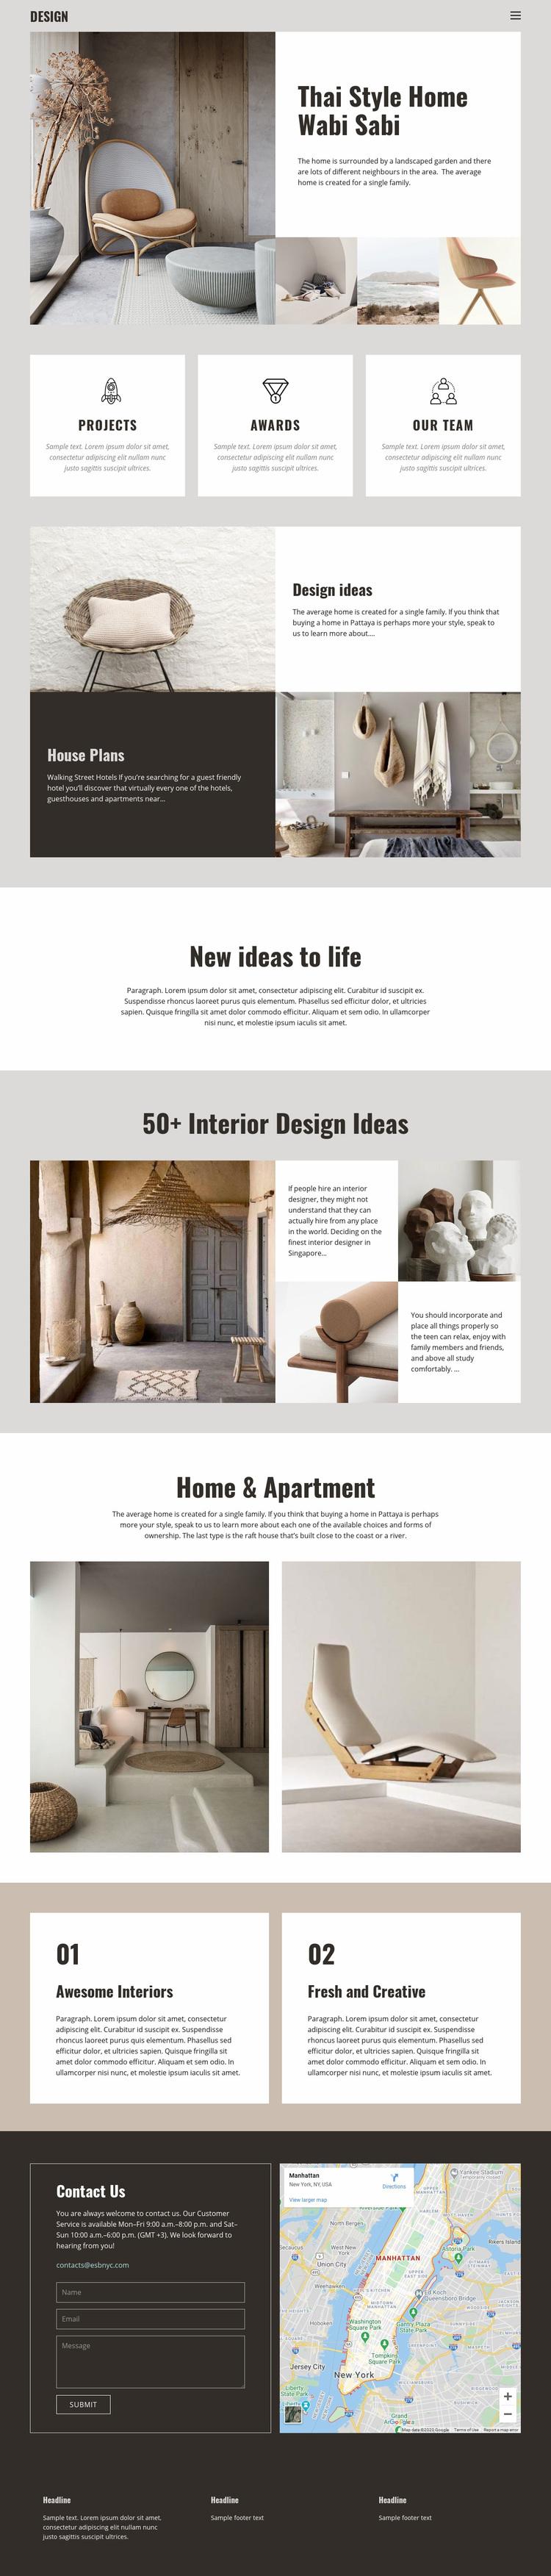 Thai style for home design Web Page Designer